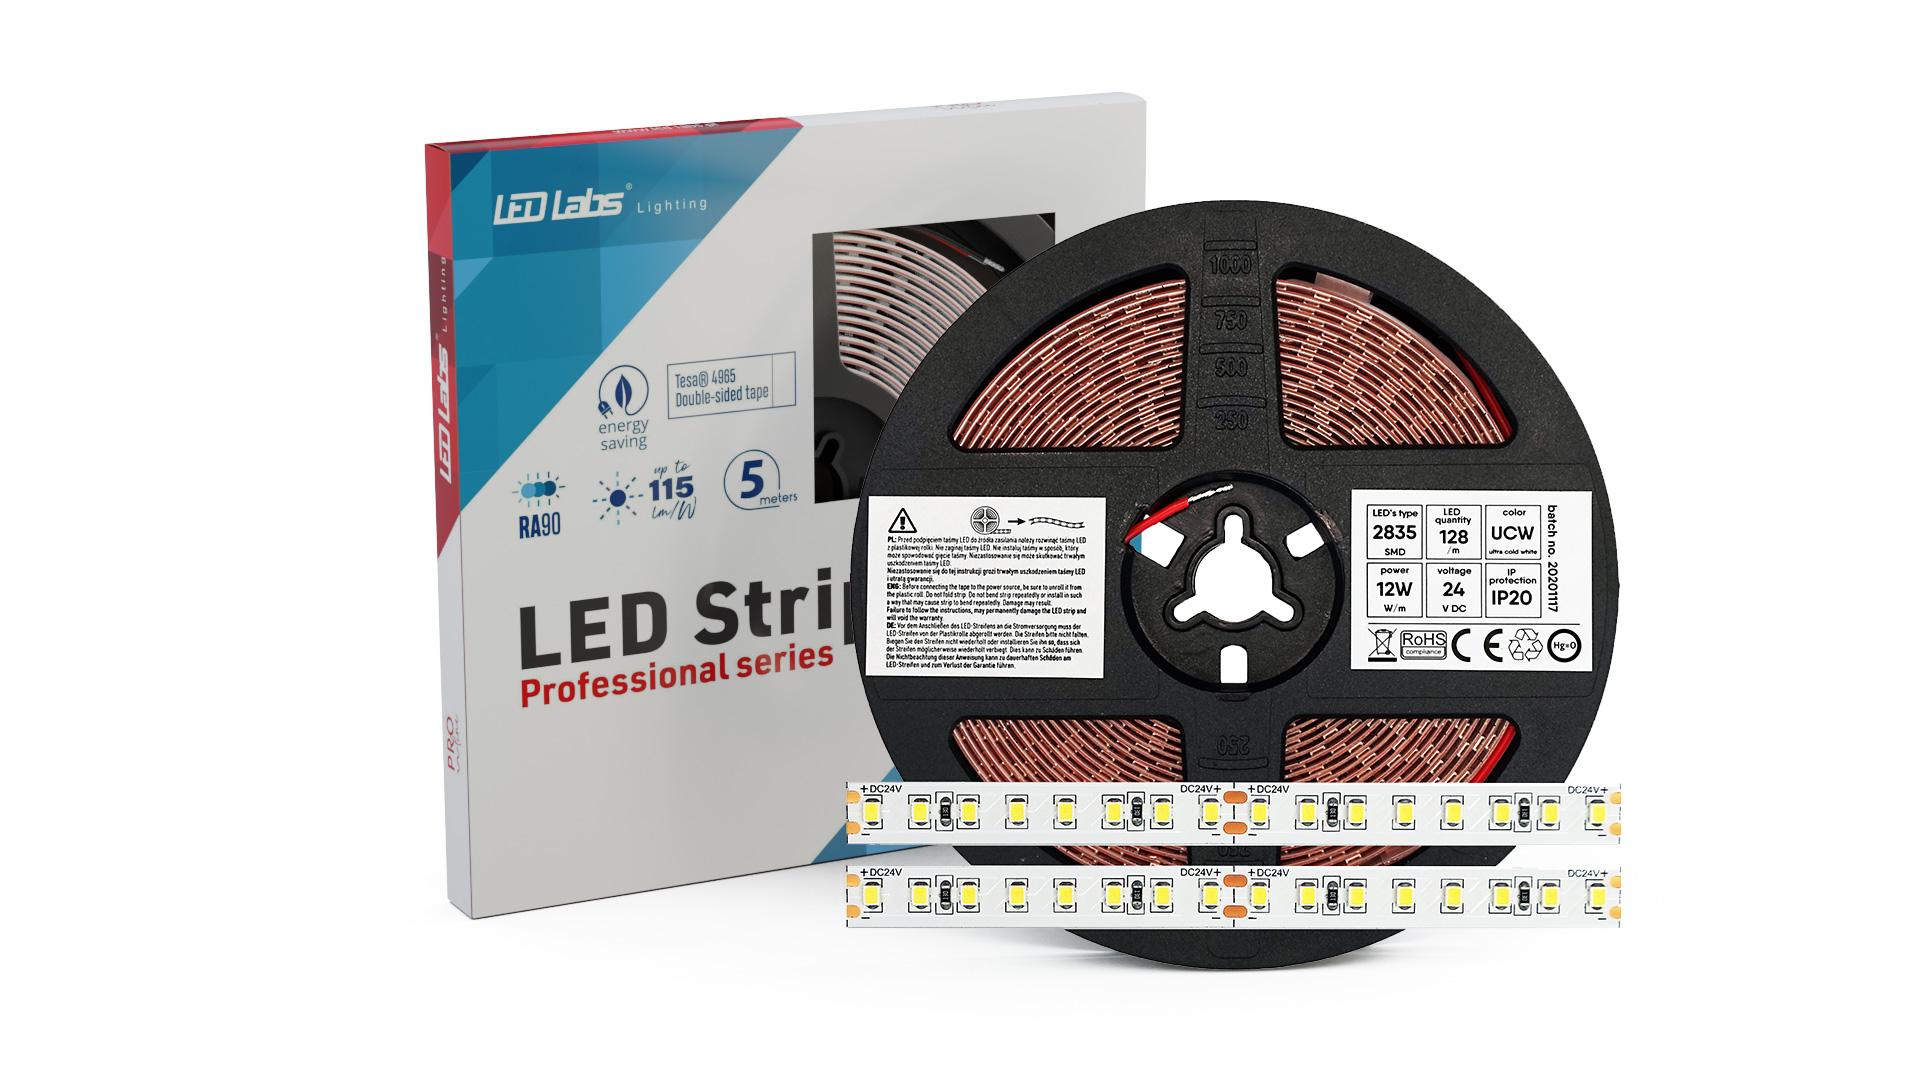 LED Strip PRO 5Y 24V 640 LED 2835 SMD 12W 2700K RA90